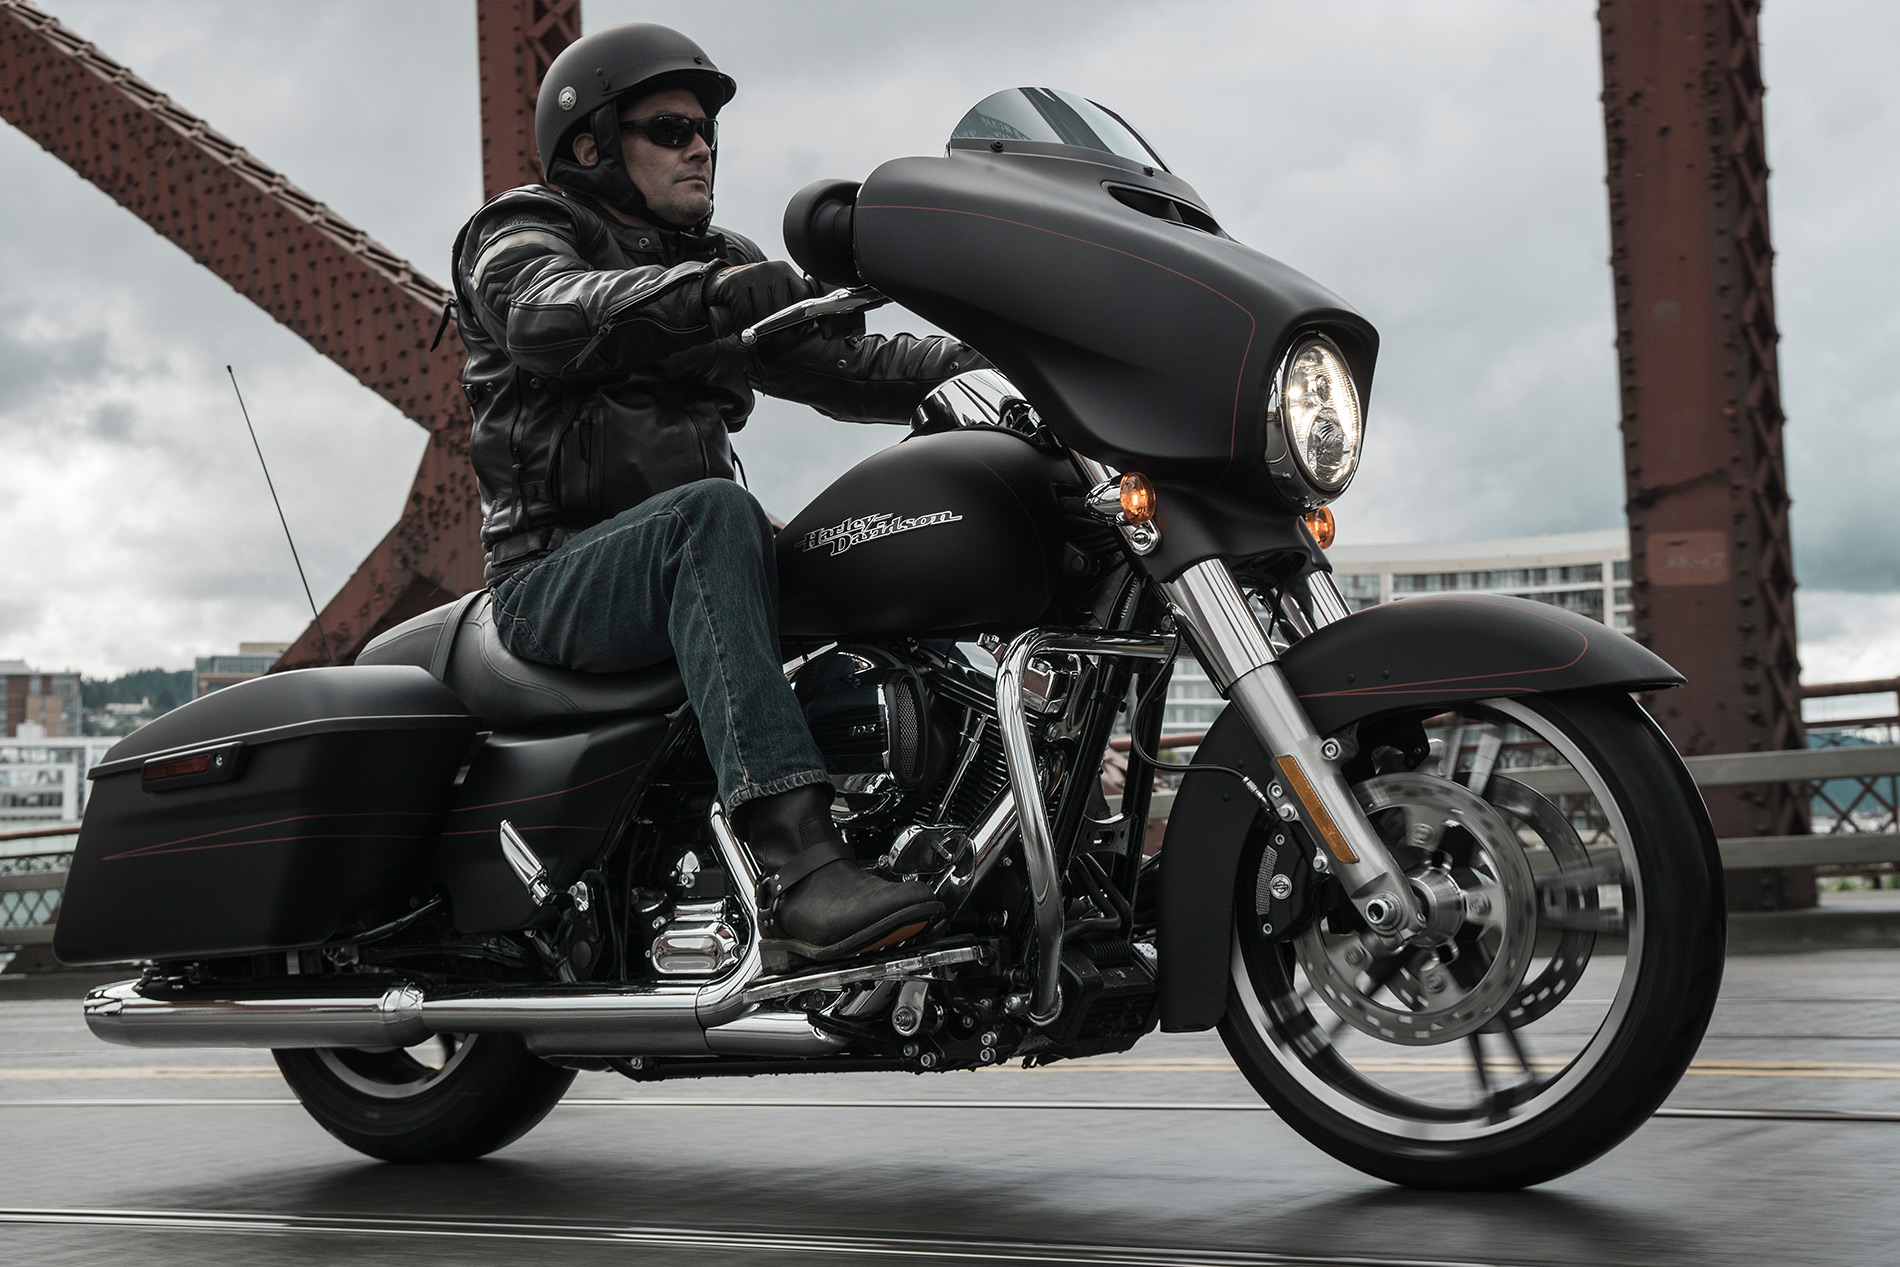 Harley Davidson Street Glide Wallpapers Vehicles Hq Harley